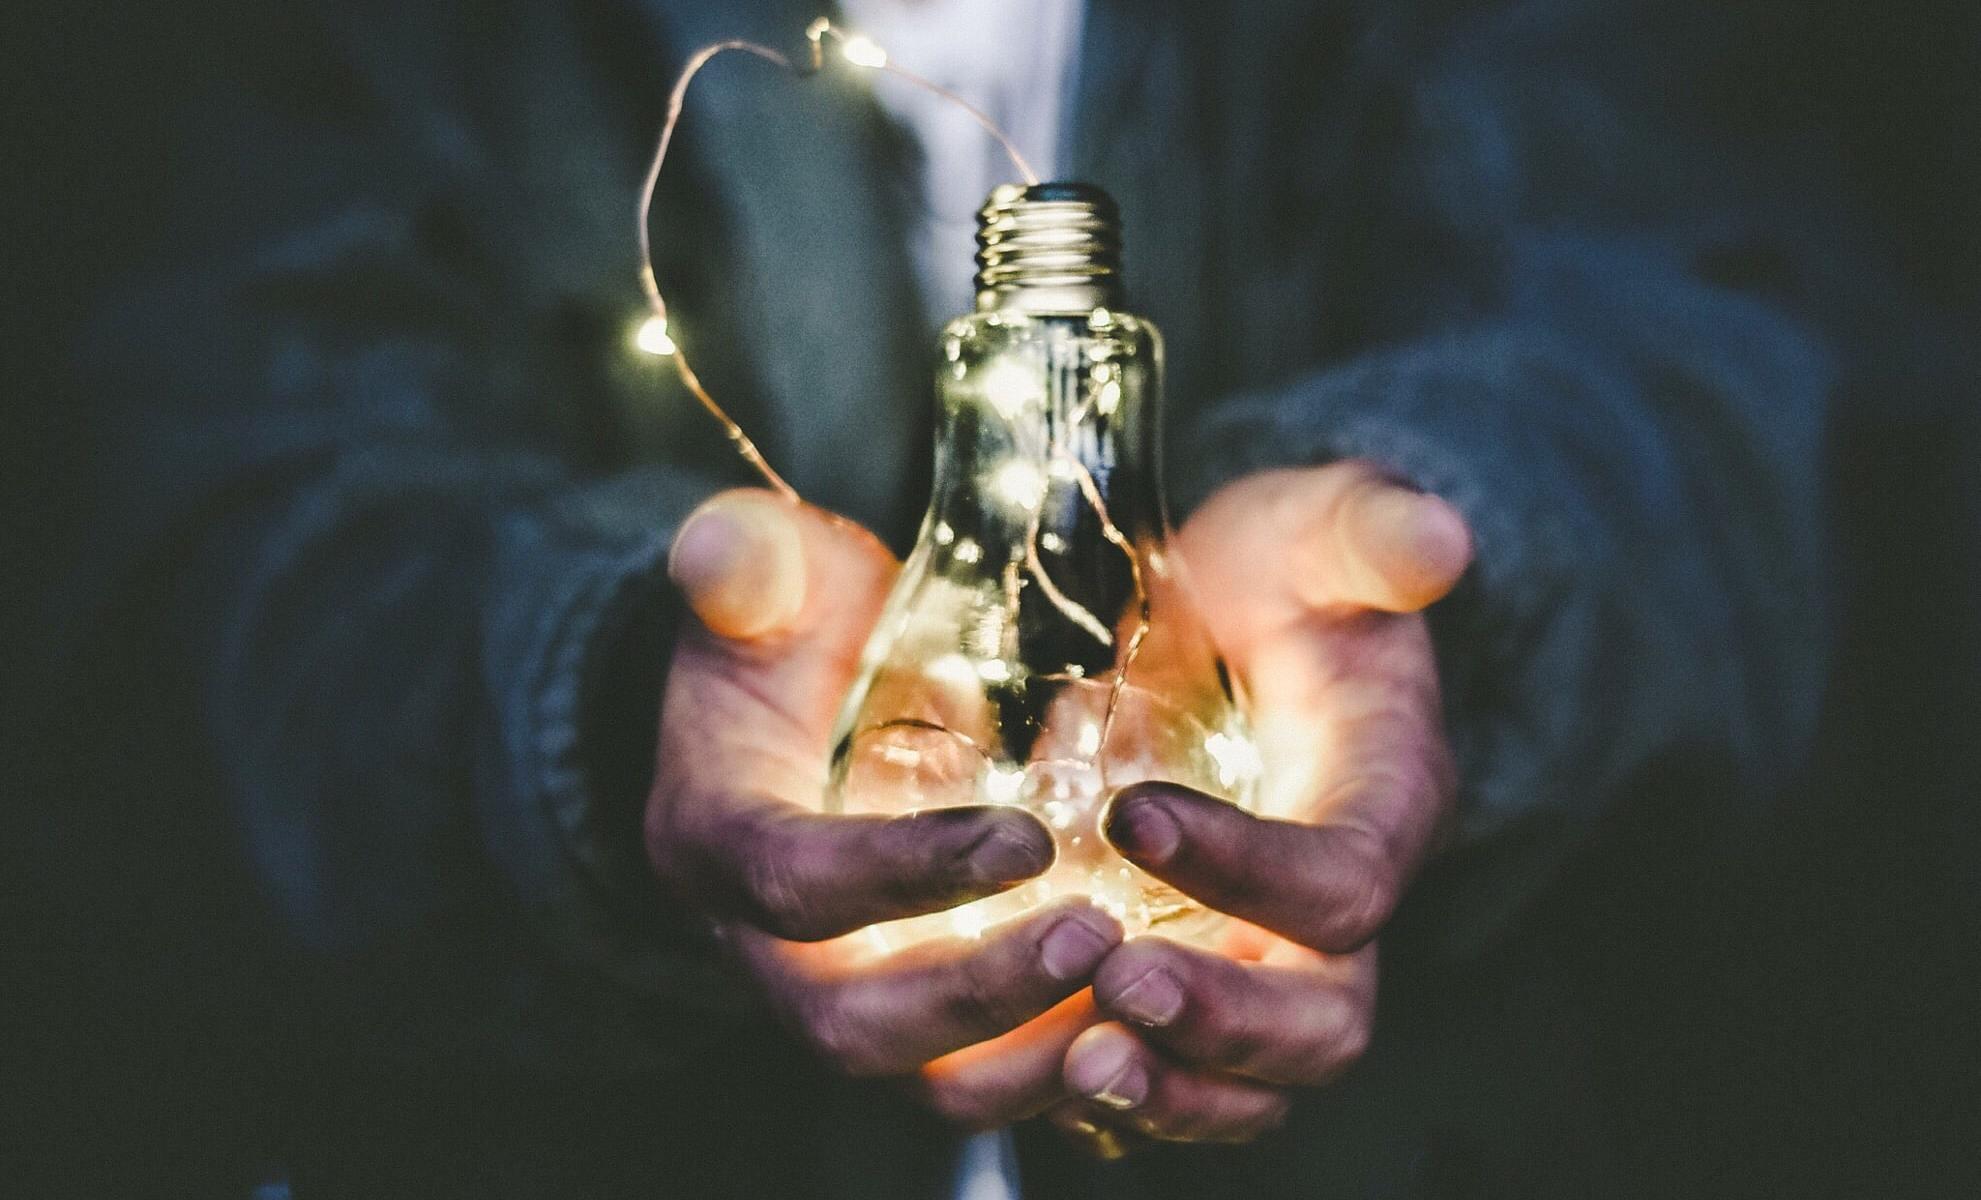 reinventarse o adaptarse